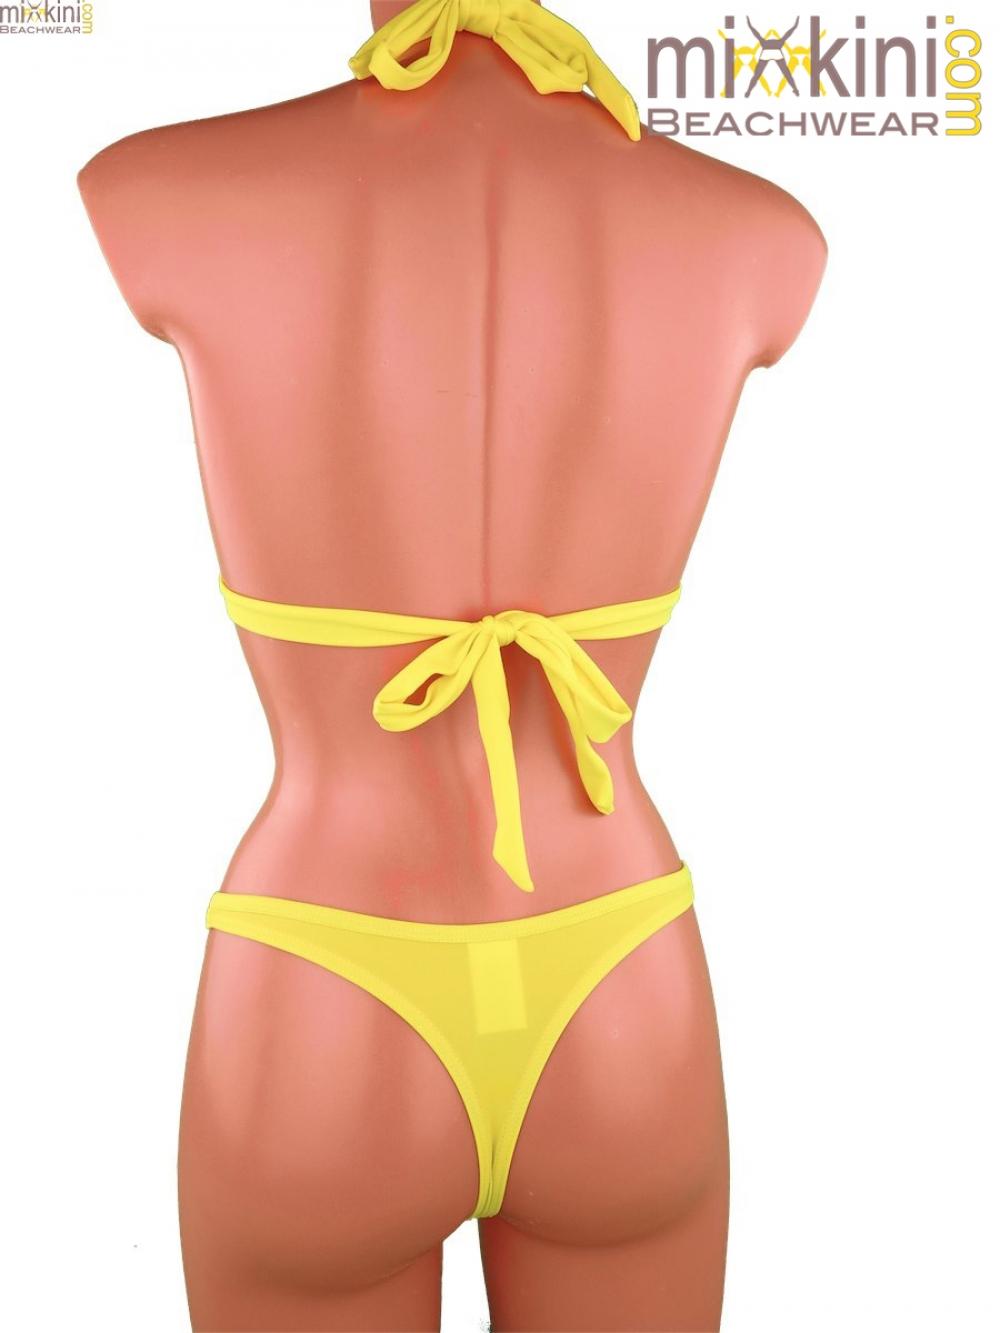 gelbe string bikinis kombi mit sch nem oberteil mixkini. Black Bedroom Furniture Sets. Home Design Ideas